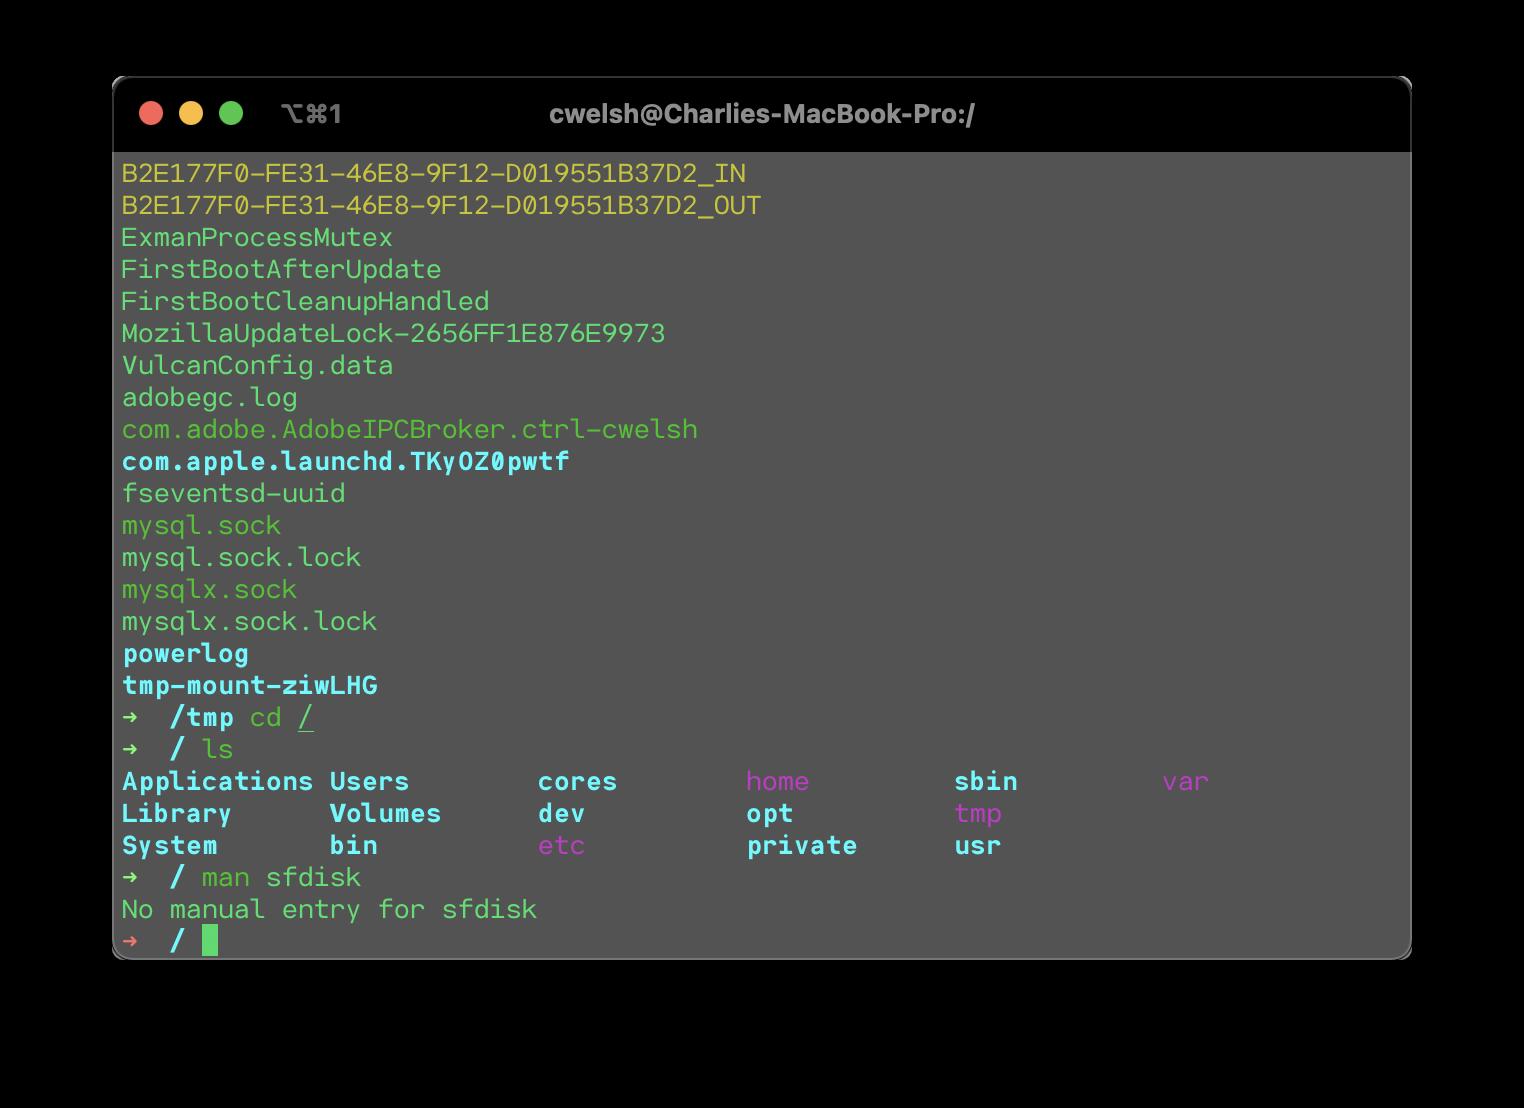 https://cloud-dg1fj672o-hack-club-bot.vercel.app/0screen_shot_2021-06-06_at_23.18.56.png